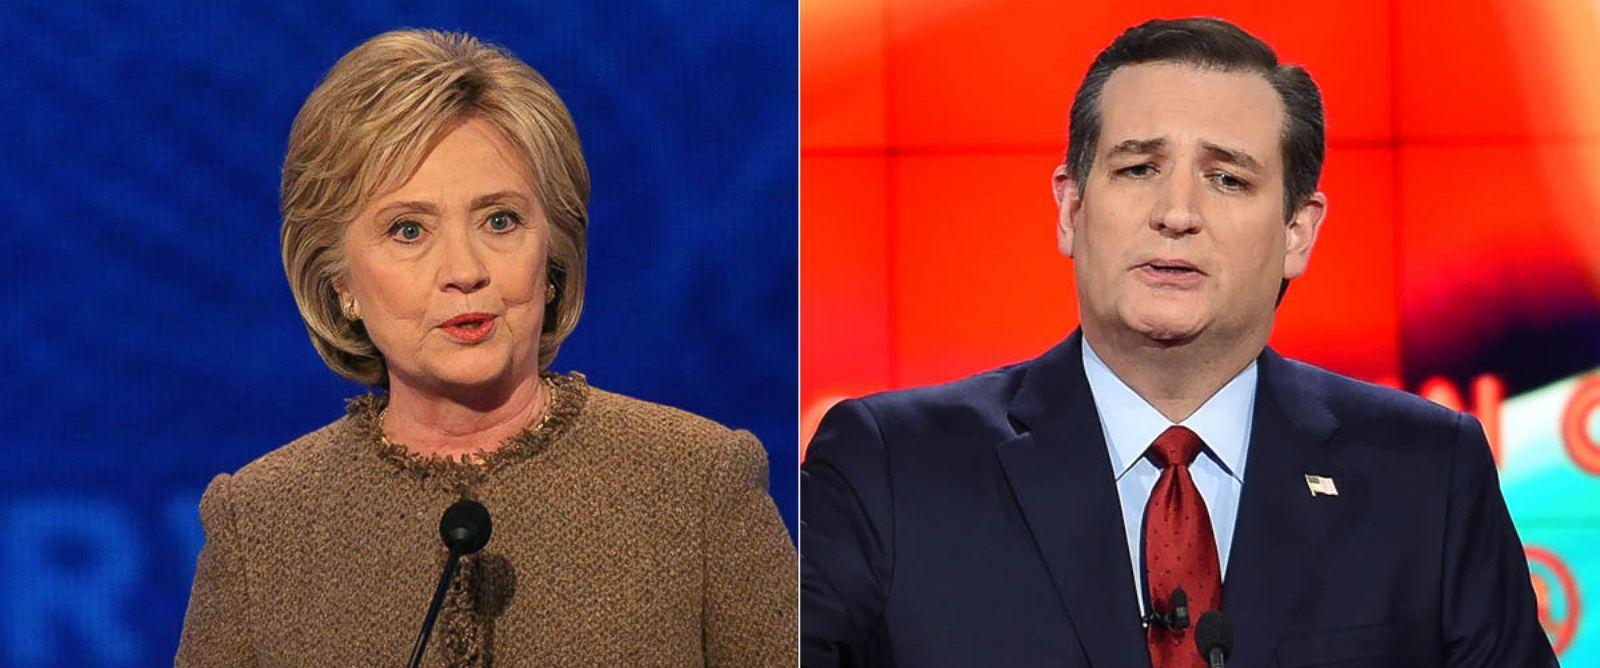 PHOTO: Ted Cruz at the Republican Presidential Debate, Dec. 15, 2015 in Las Vegas. Hillary Clinton at the Democratic Presidential Debate, Dec. 19, 2015 in Manchester, New Hampshire.